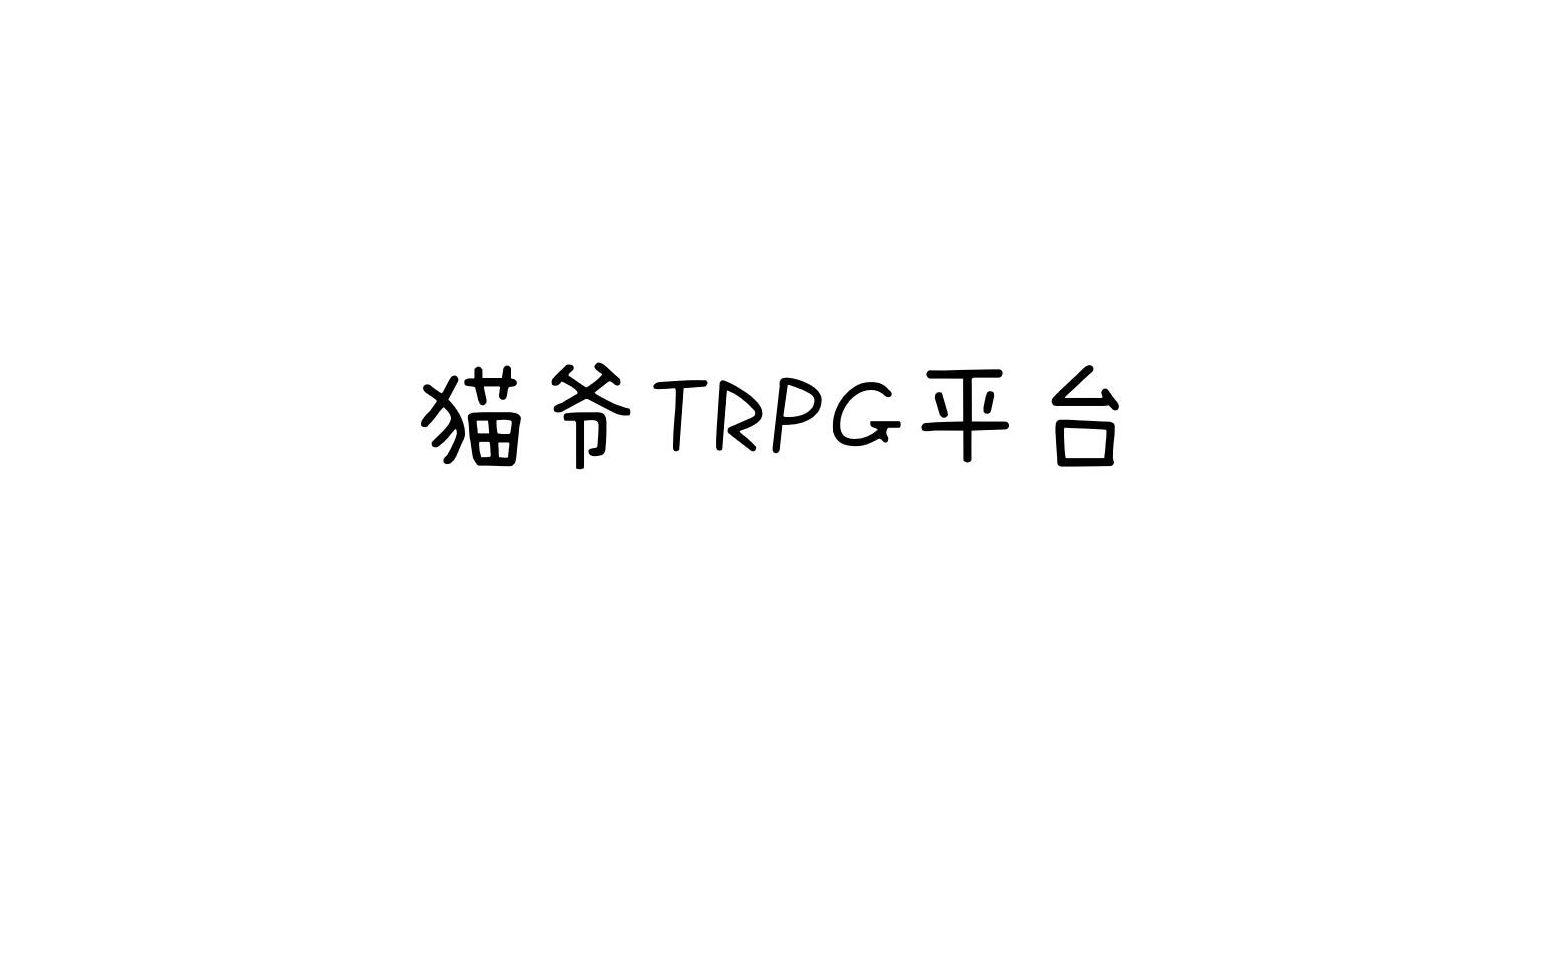 COC/TRPG跑团平台-猫爷TRPG平台上线啦!